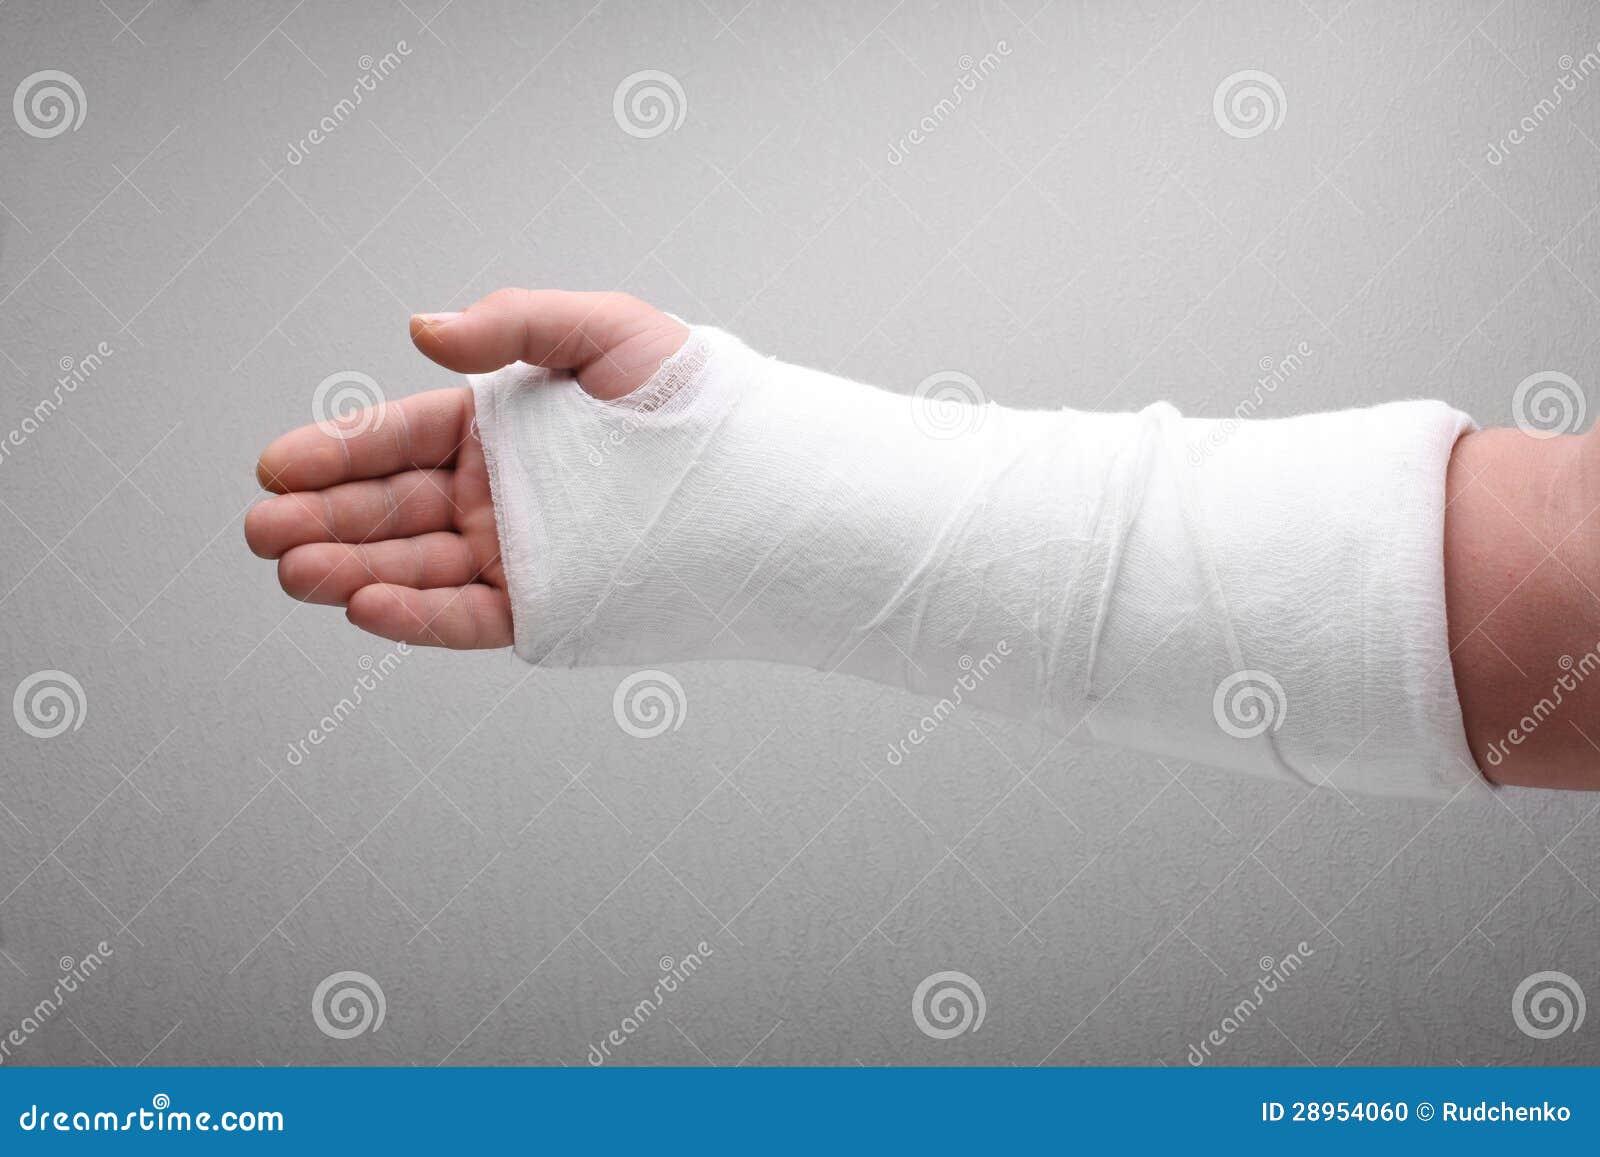 Broken Arm Bone In Cast Stock Photo - Image: 28954060